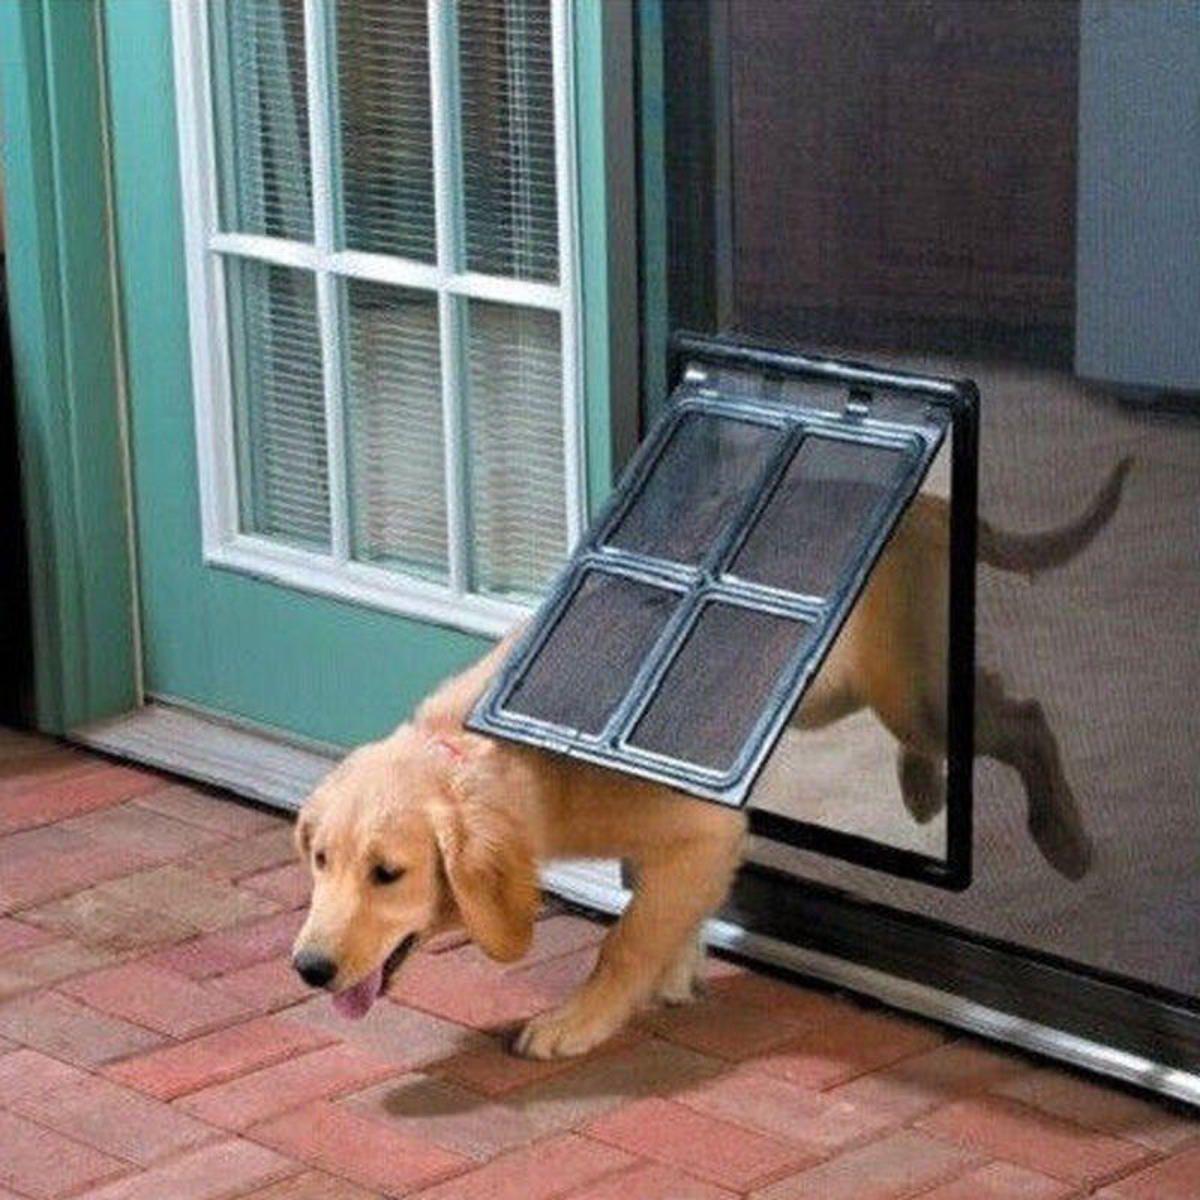 Dog Cat Pet Large Screen Door 2 Way Flap Lock Gate Way For Window